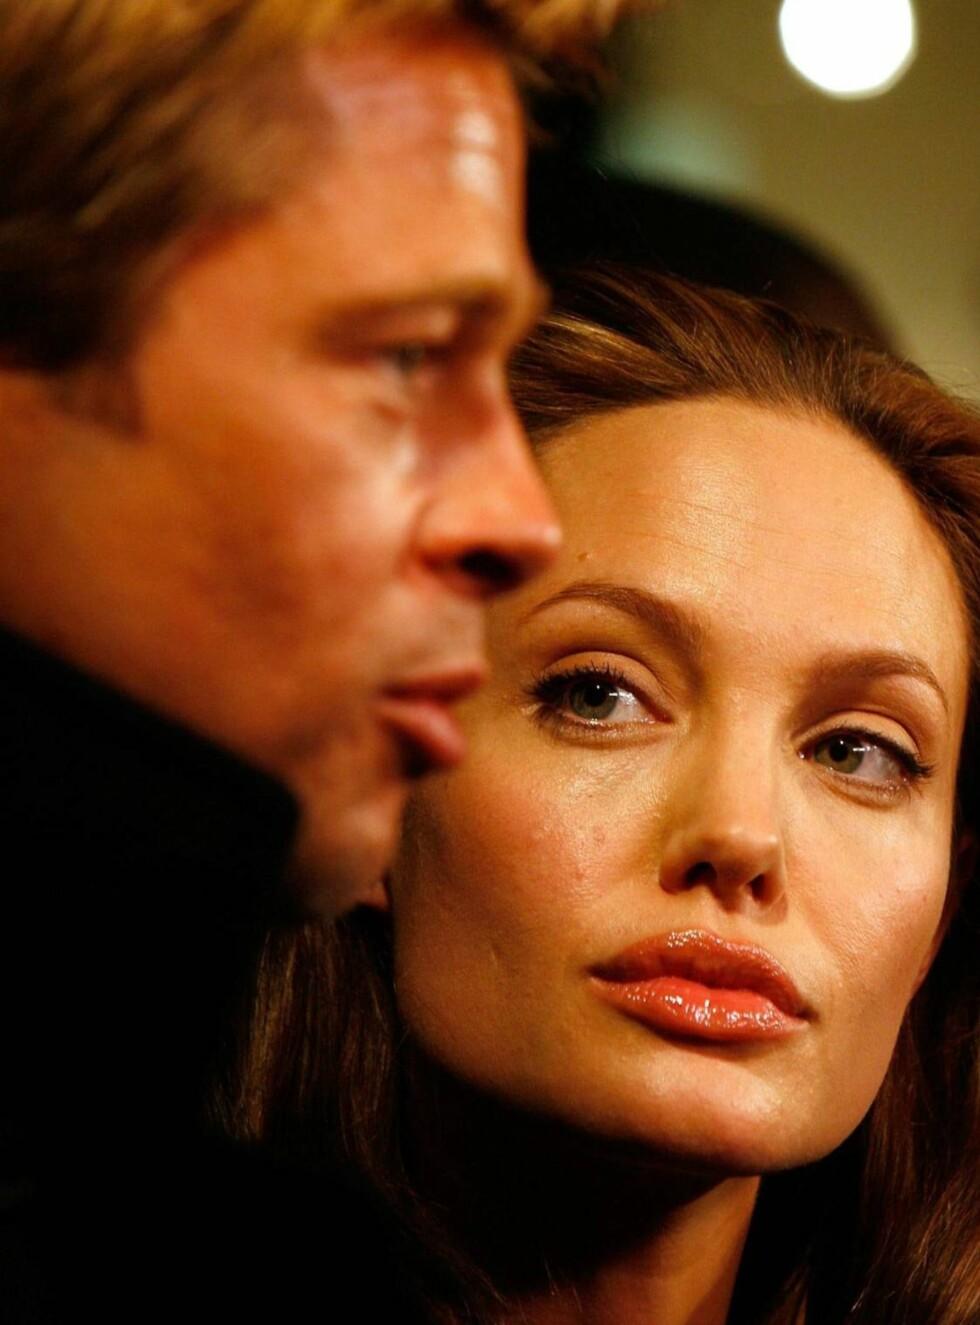 PENT PAR: Brad Pitt og Angelina Jolie Foto: All Over Press